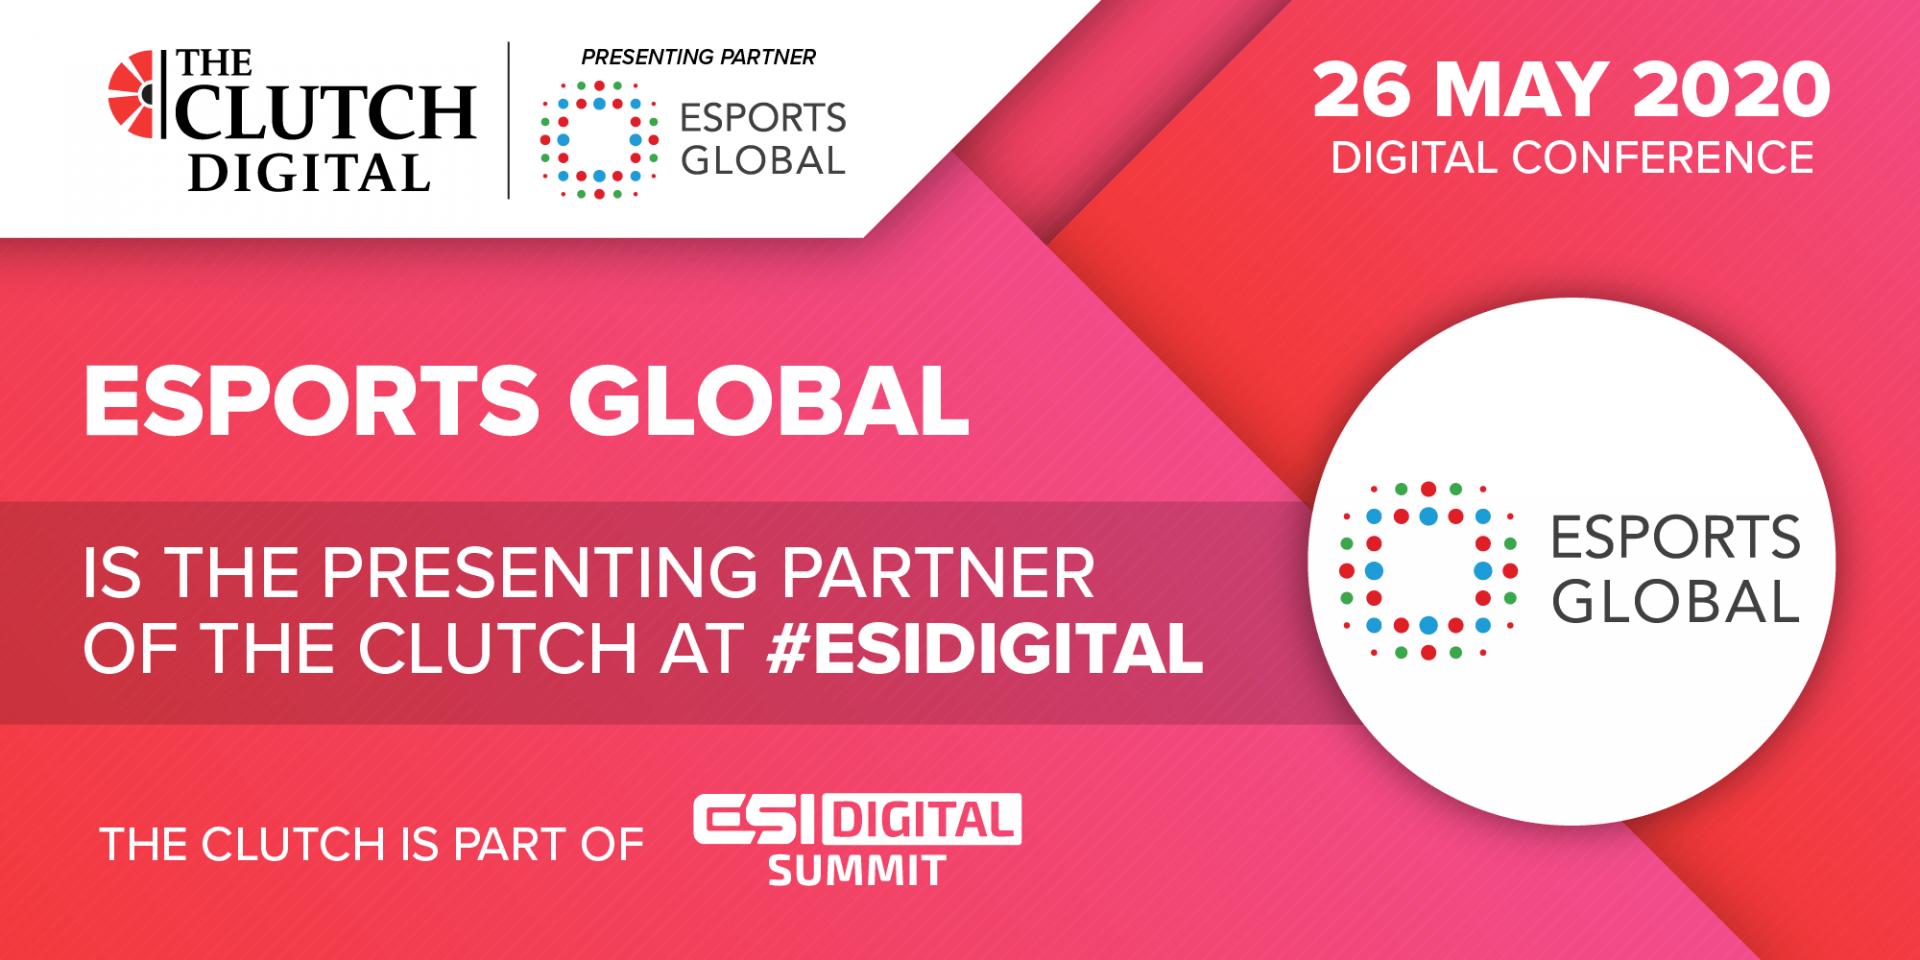 The Clutch Digital Esports Global